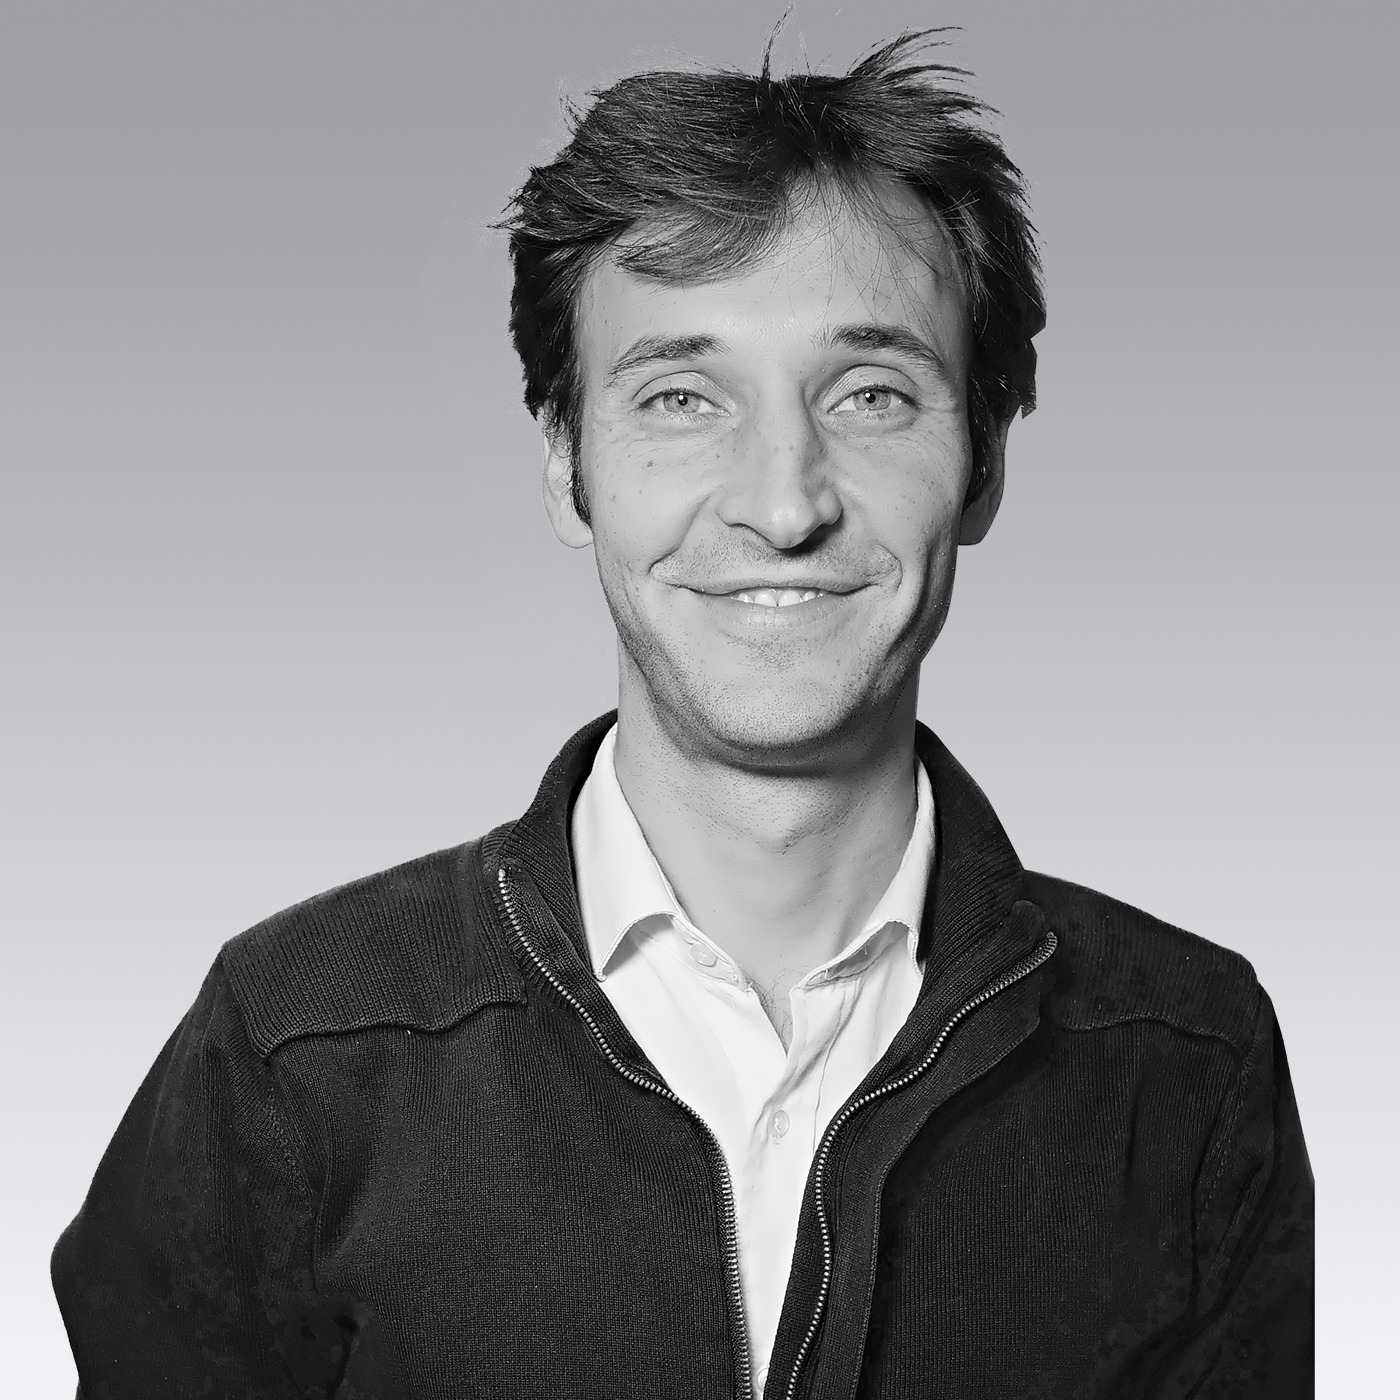 Marc Lilot